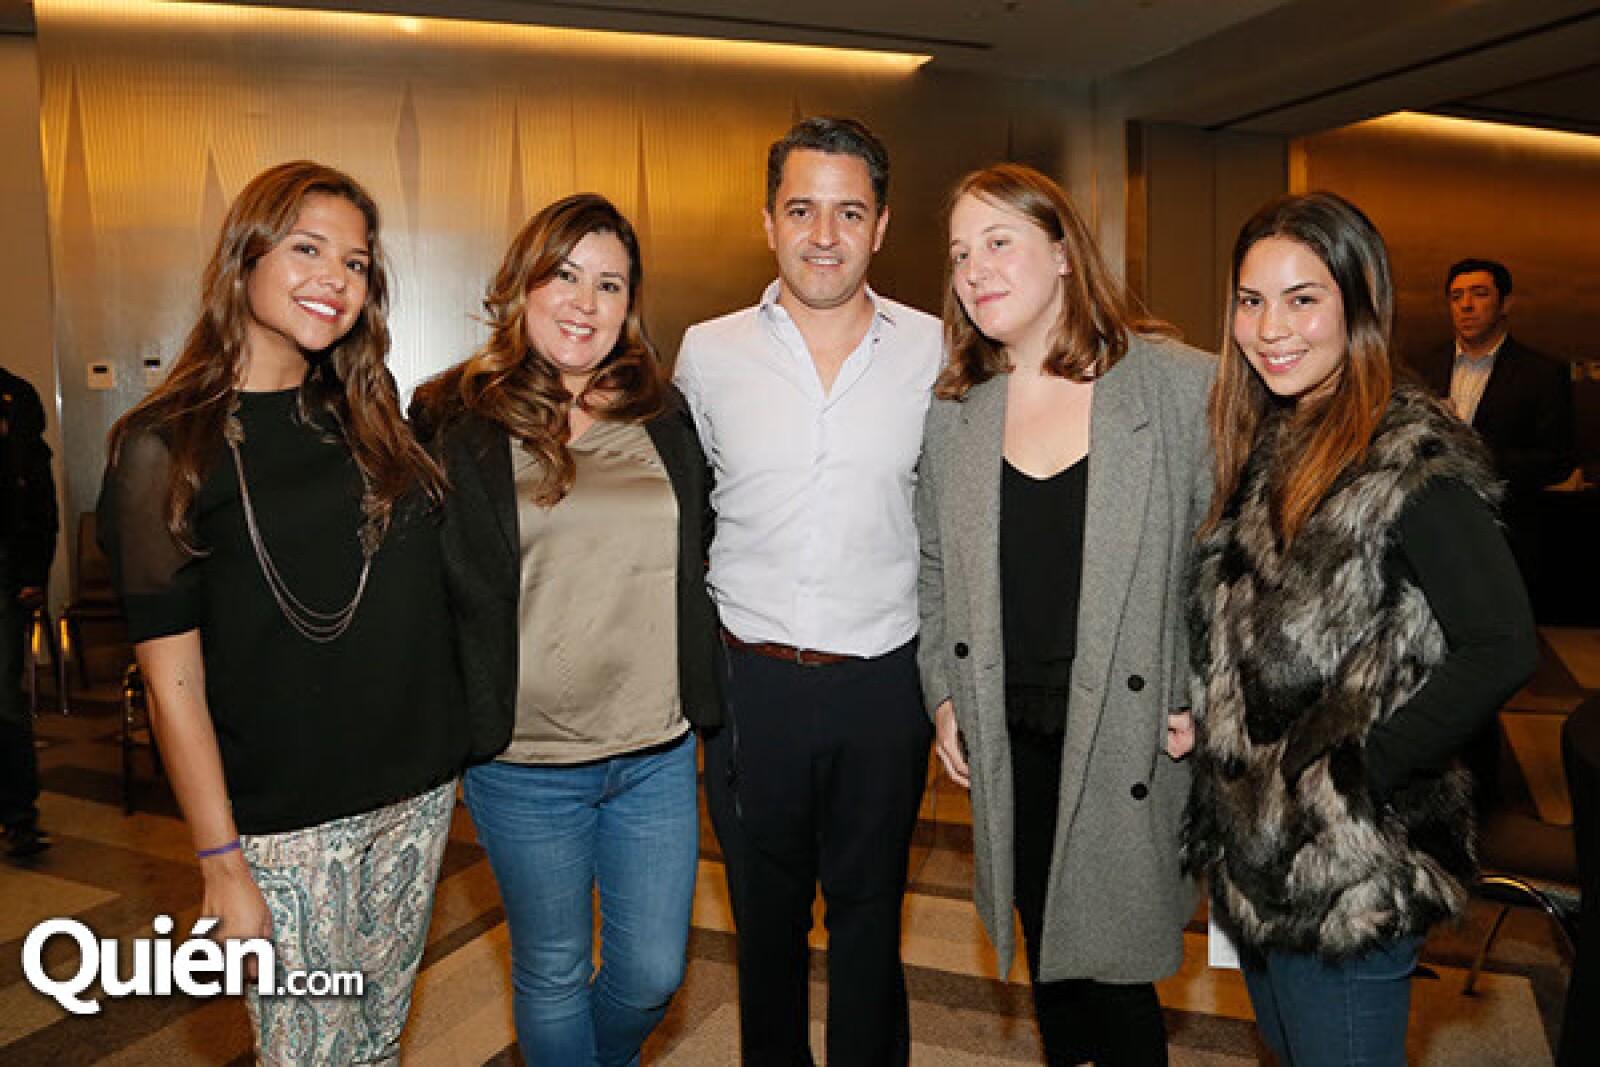 Cristina Coghlan,Diana Alarcón,Eduardo Uribe,Christina Canino y Mariana Camarena